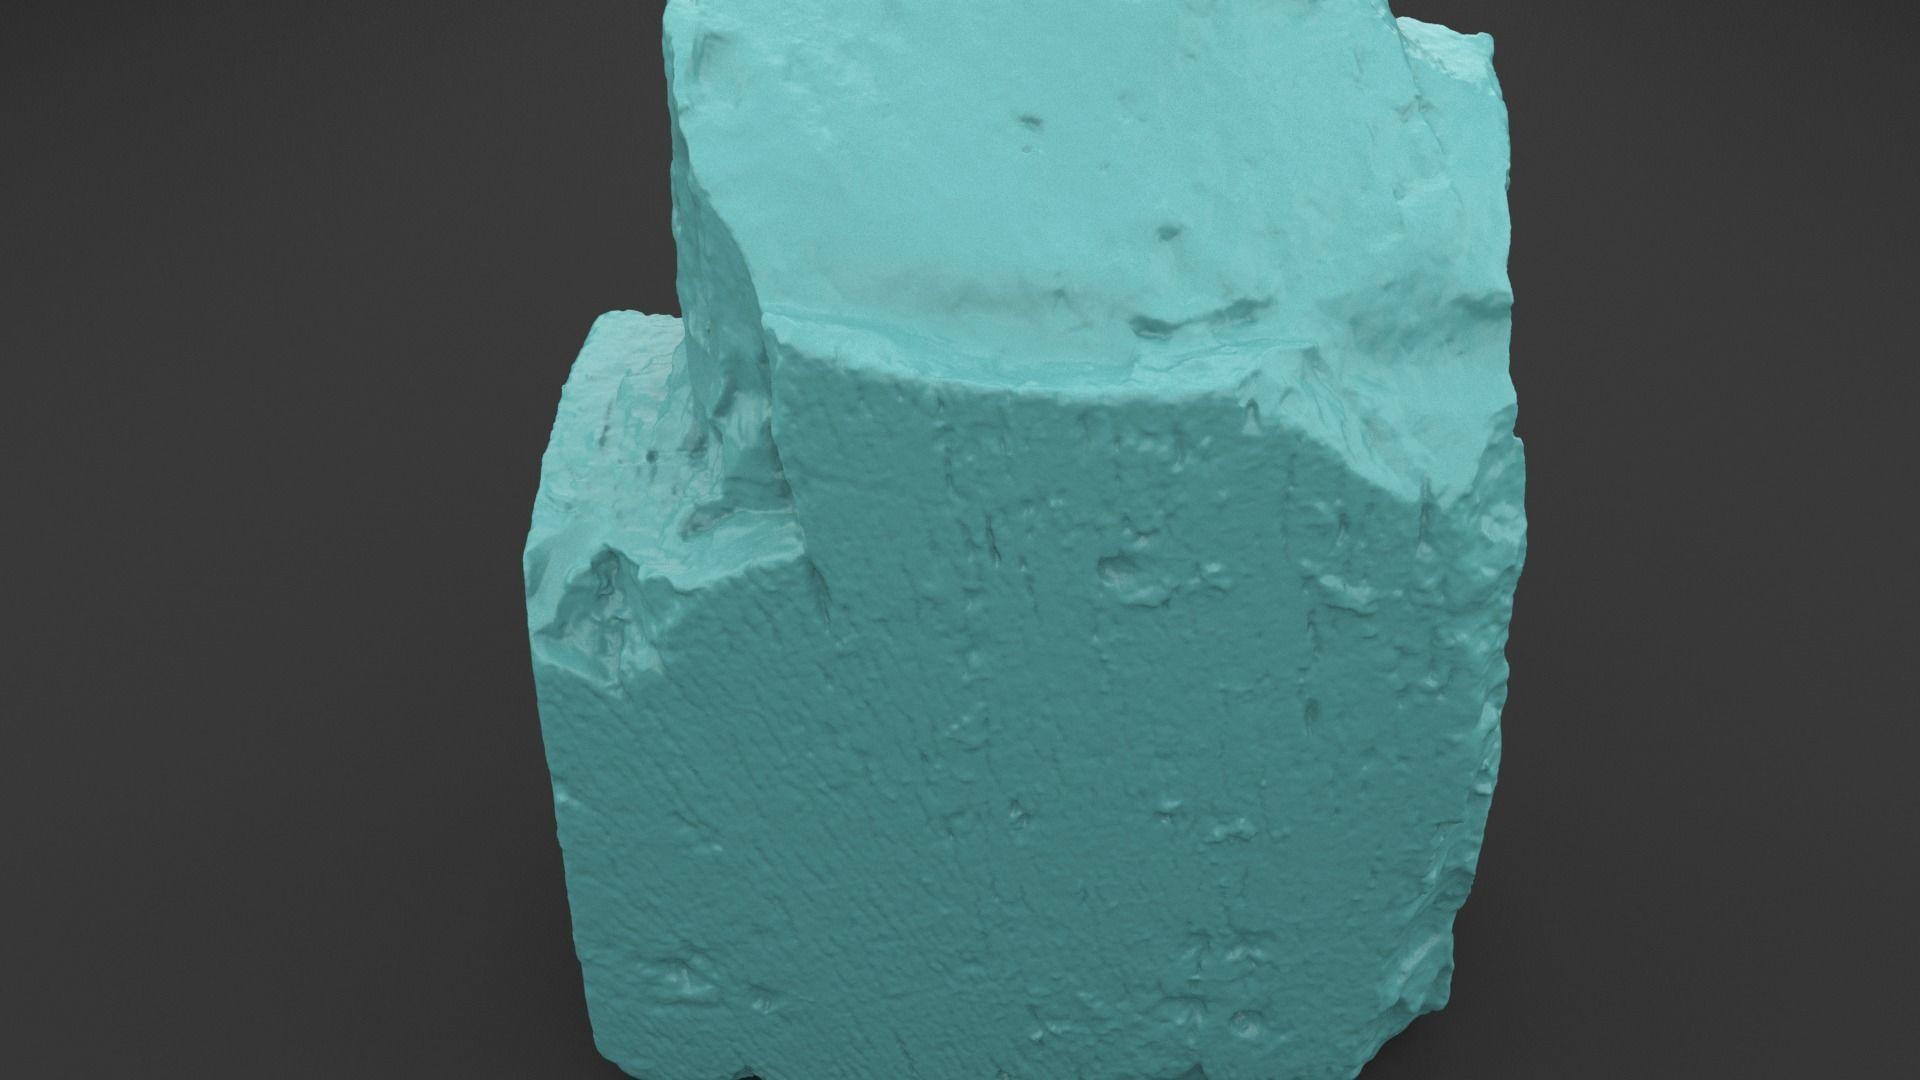 Scanned Old Red Brick 3D Print Model